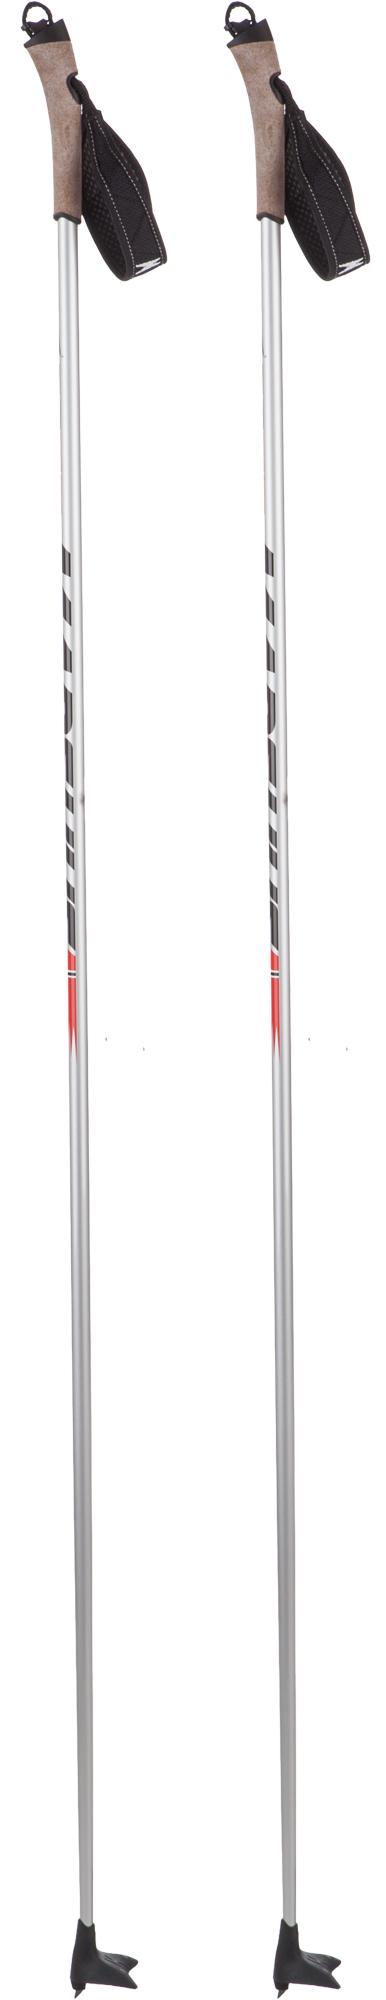 Madshus Палки для беговых лыж Madshus CT 20, размер 145